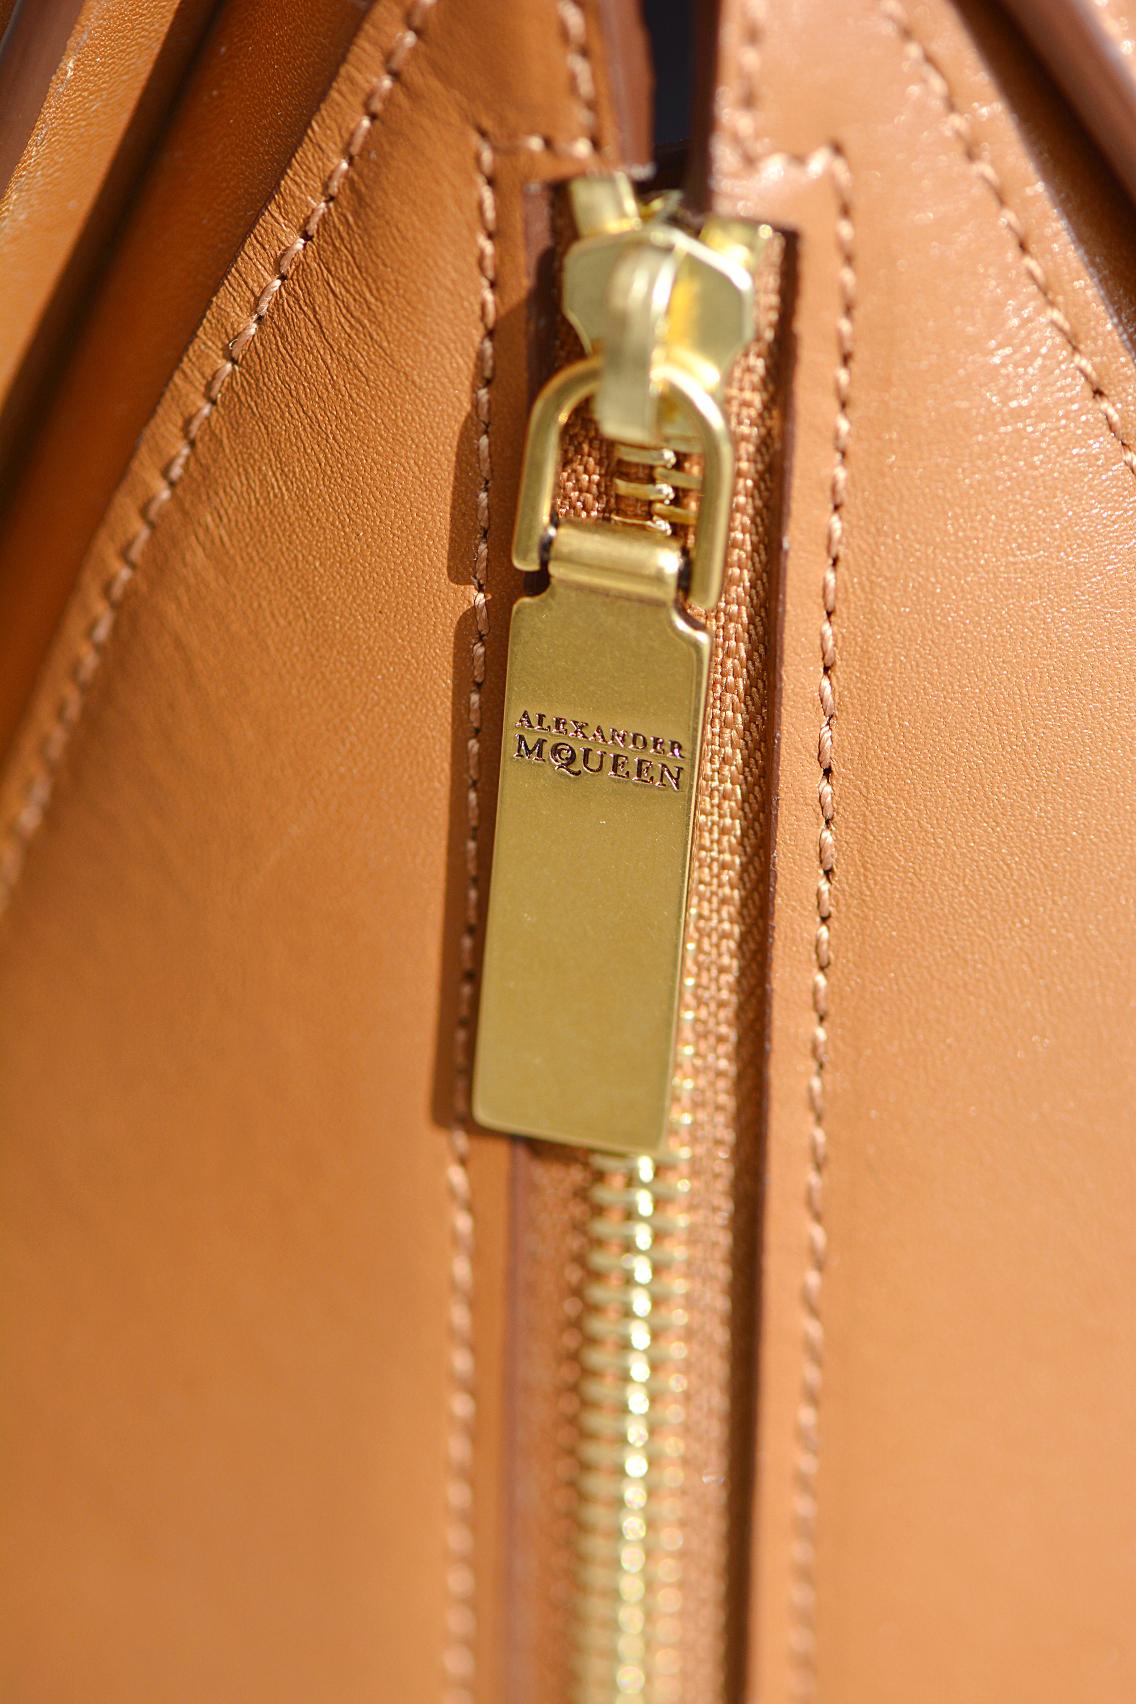 Alexander McQueen Small Heroine Bag Purse in Burnt Camel 12